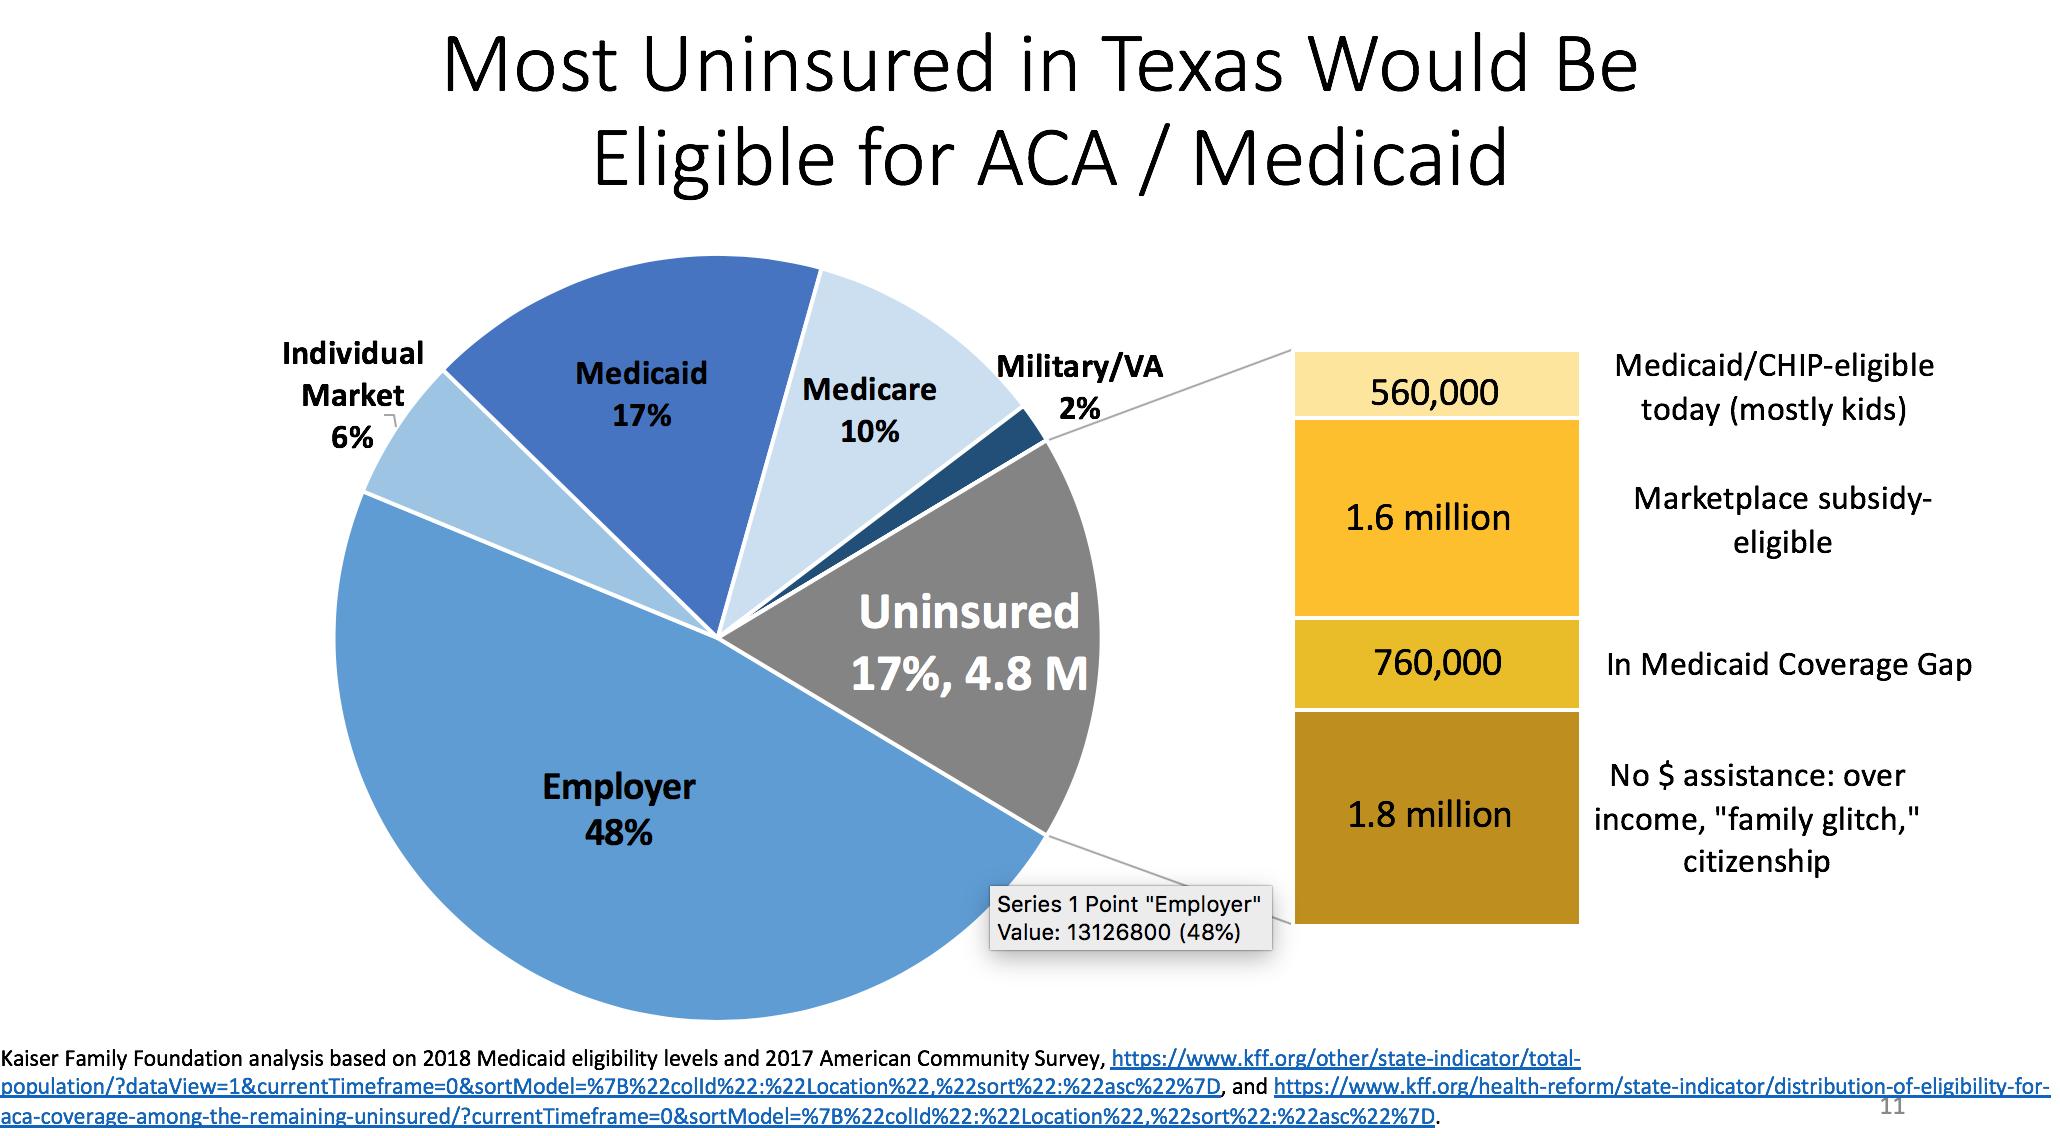 Uninsured in Texas